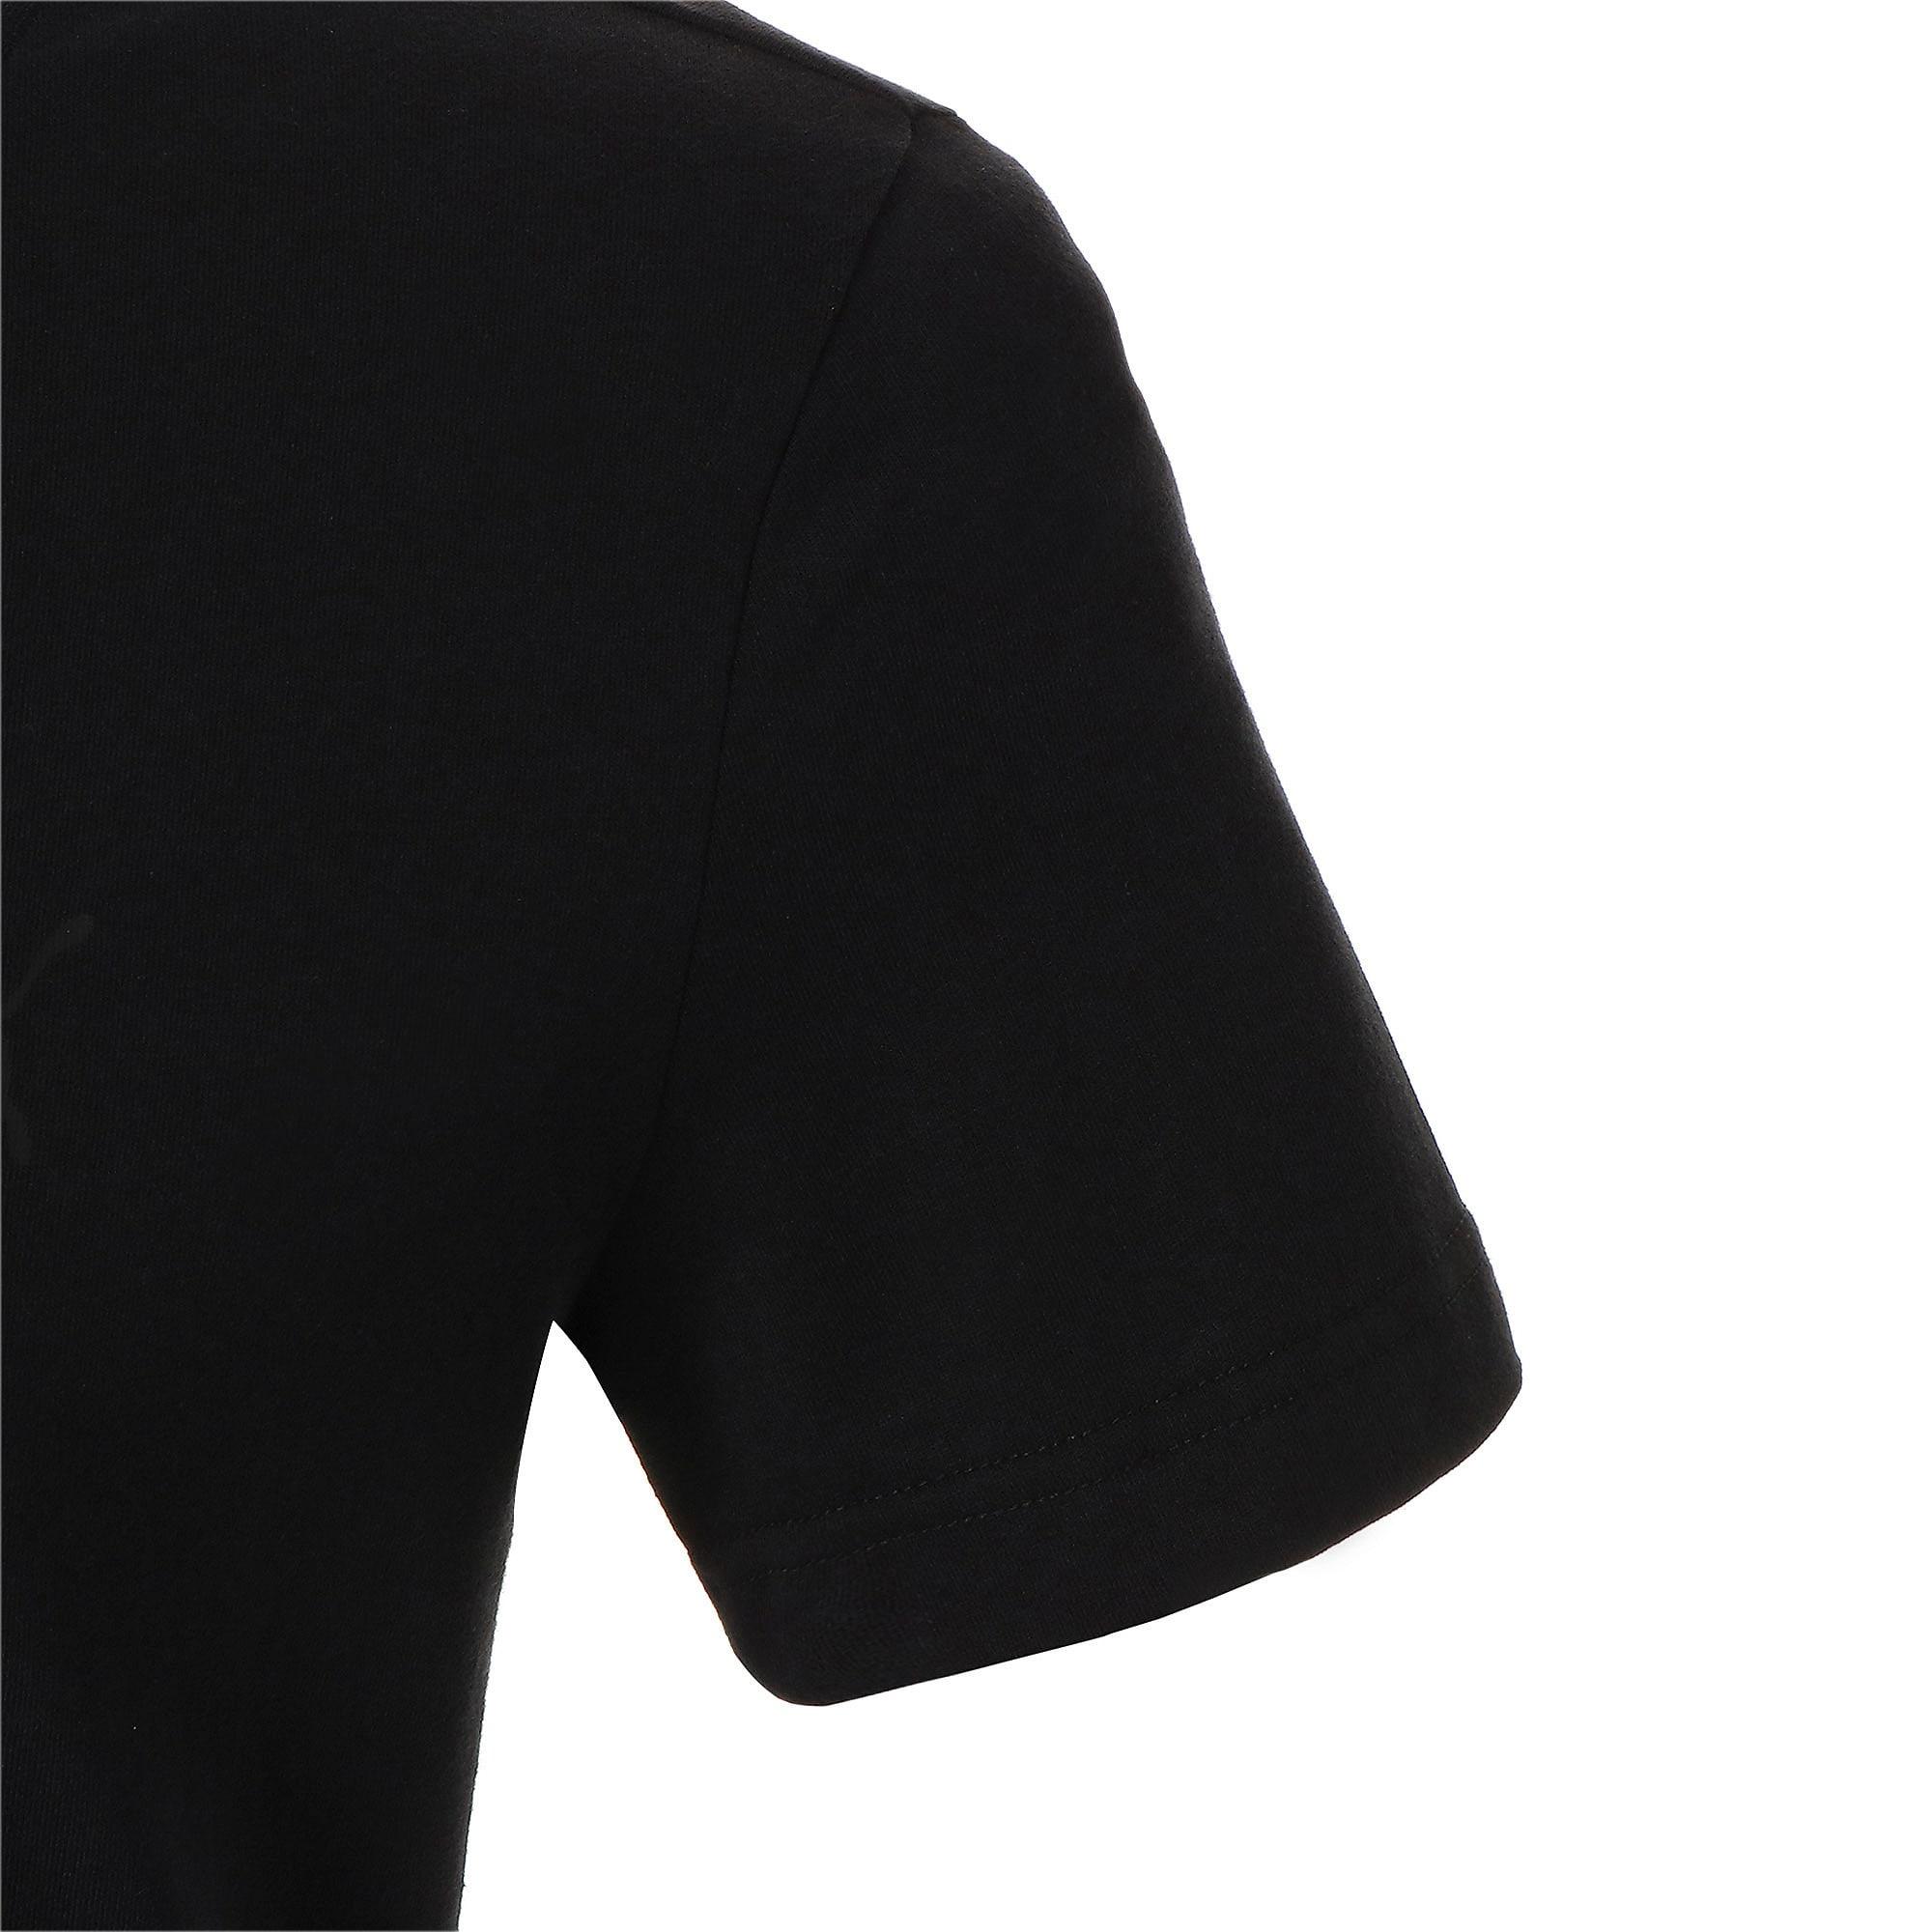 Thumbnail 5 of PUMA x SUE TSAI ウィメンズ Tシャツ, Puma Black, medium-JPN